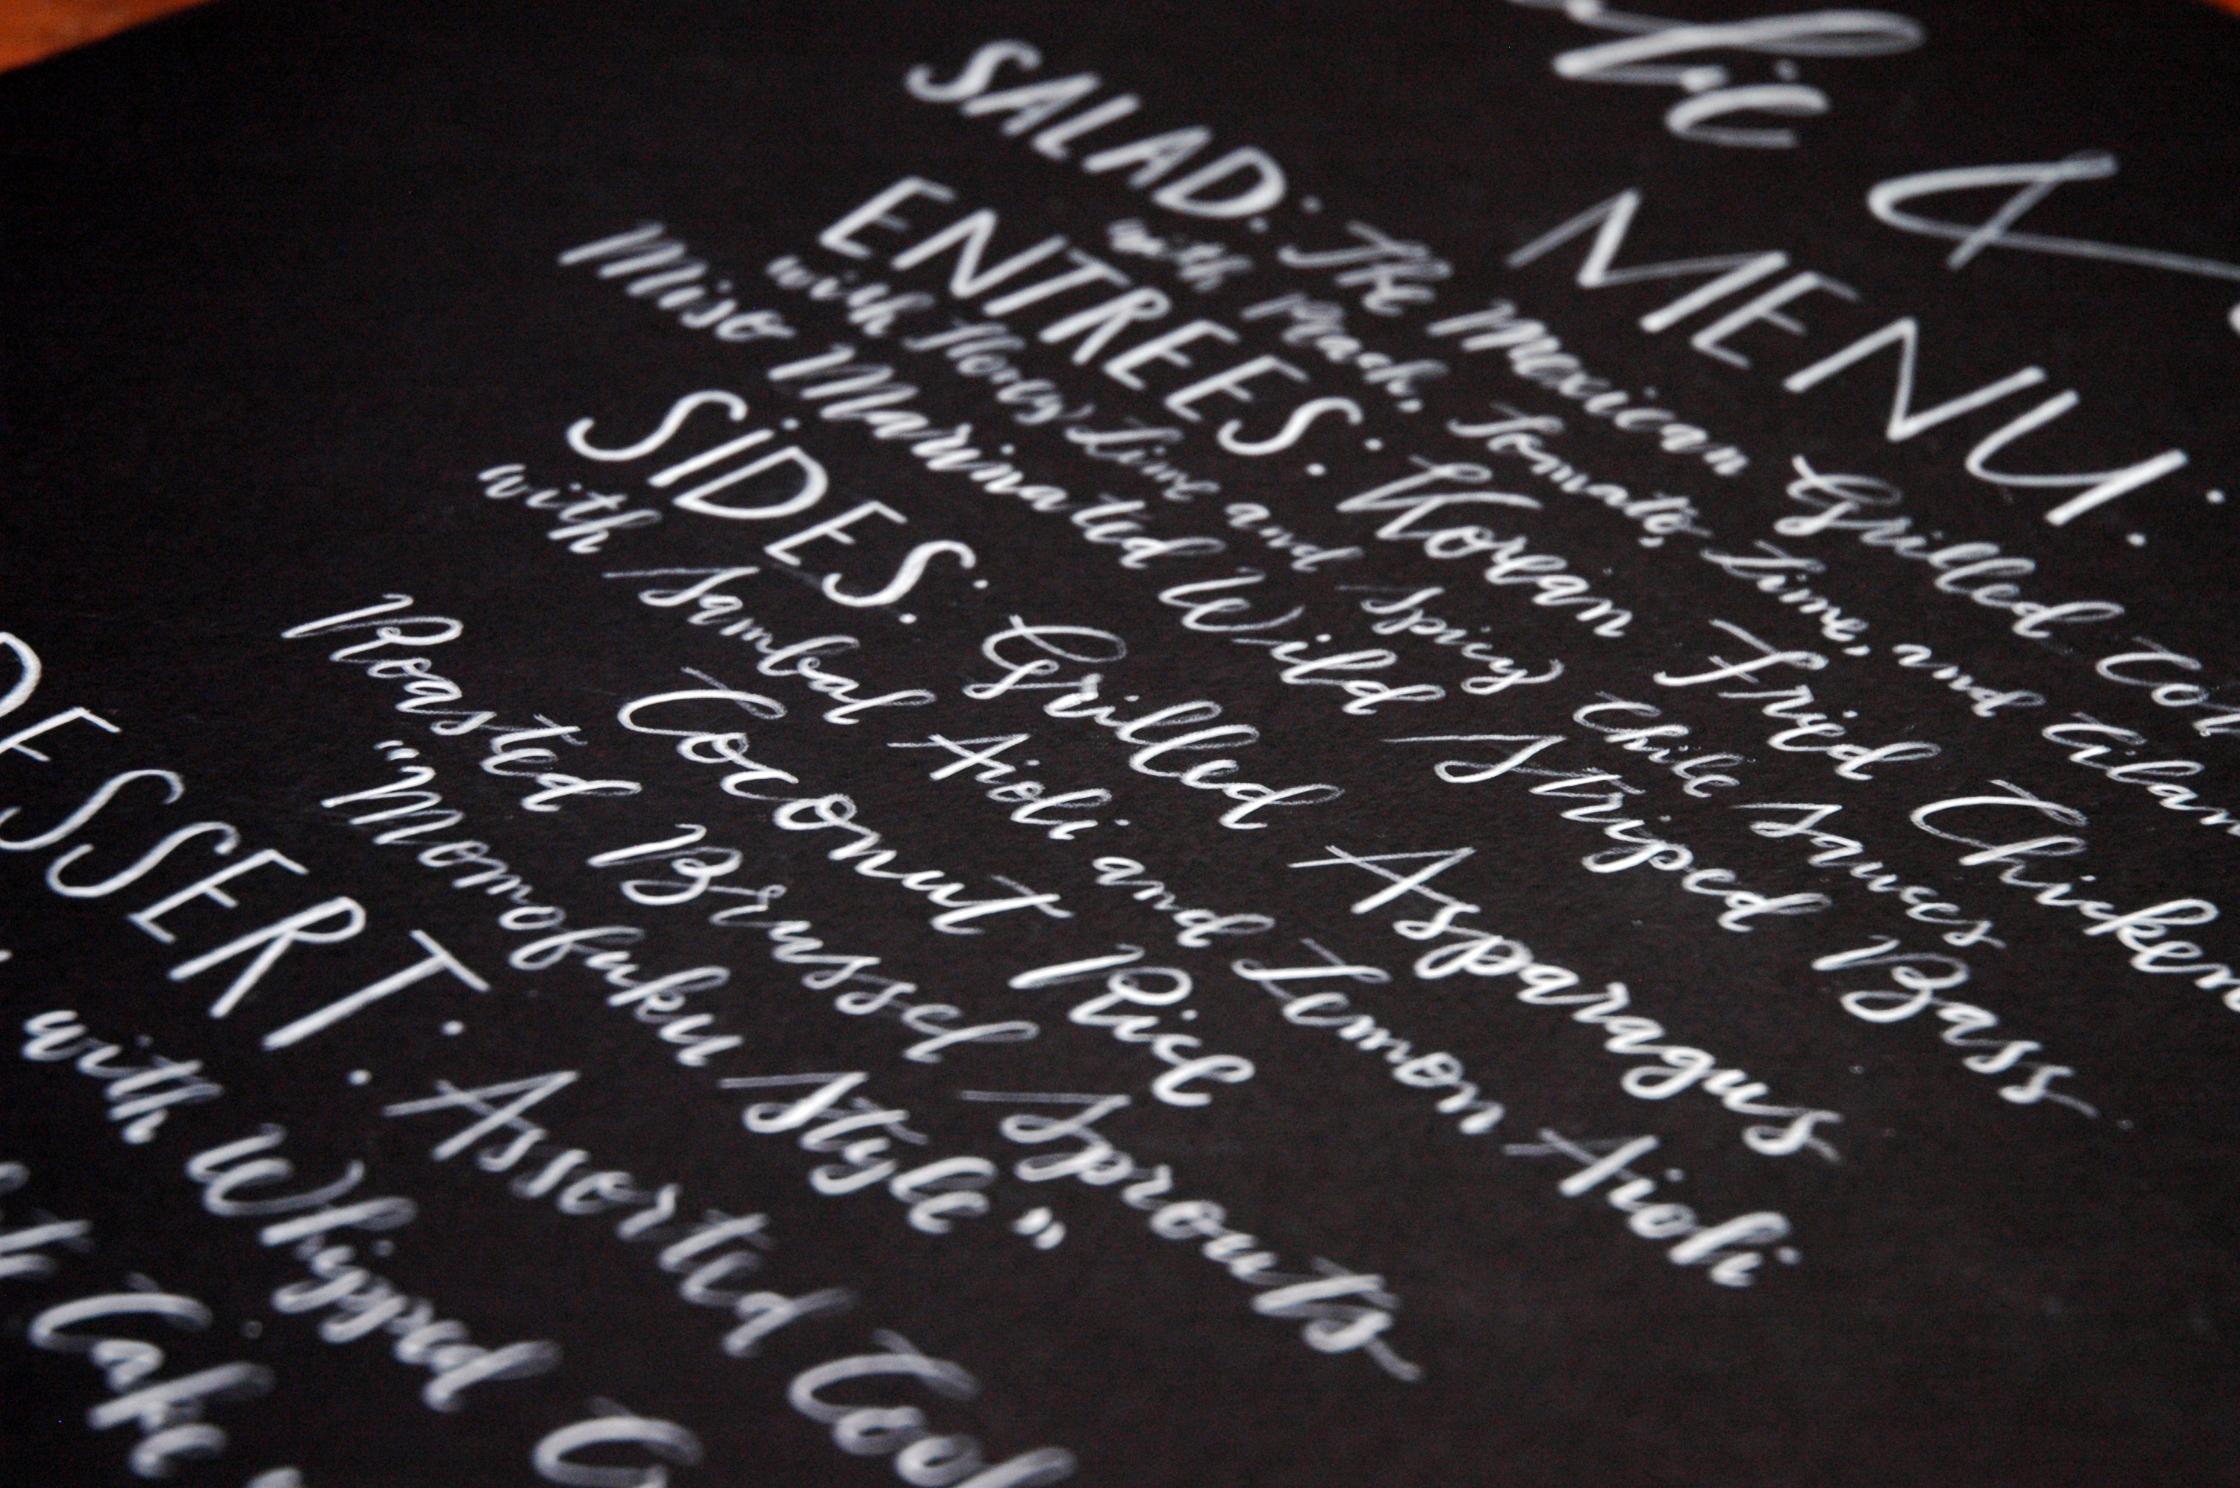 chalkboardmenu.JPG